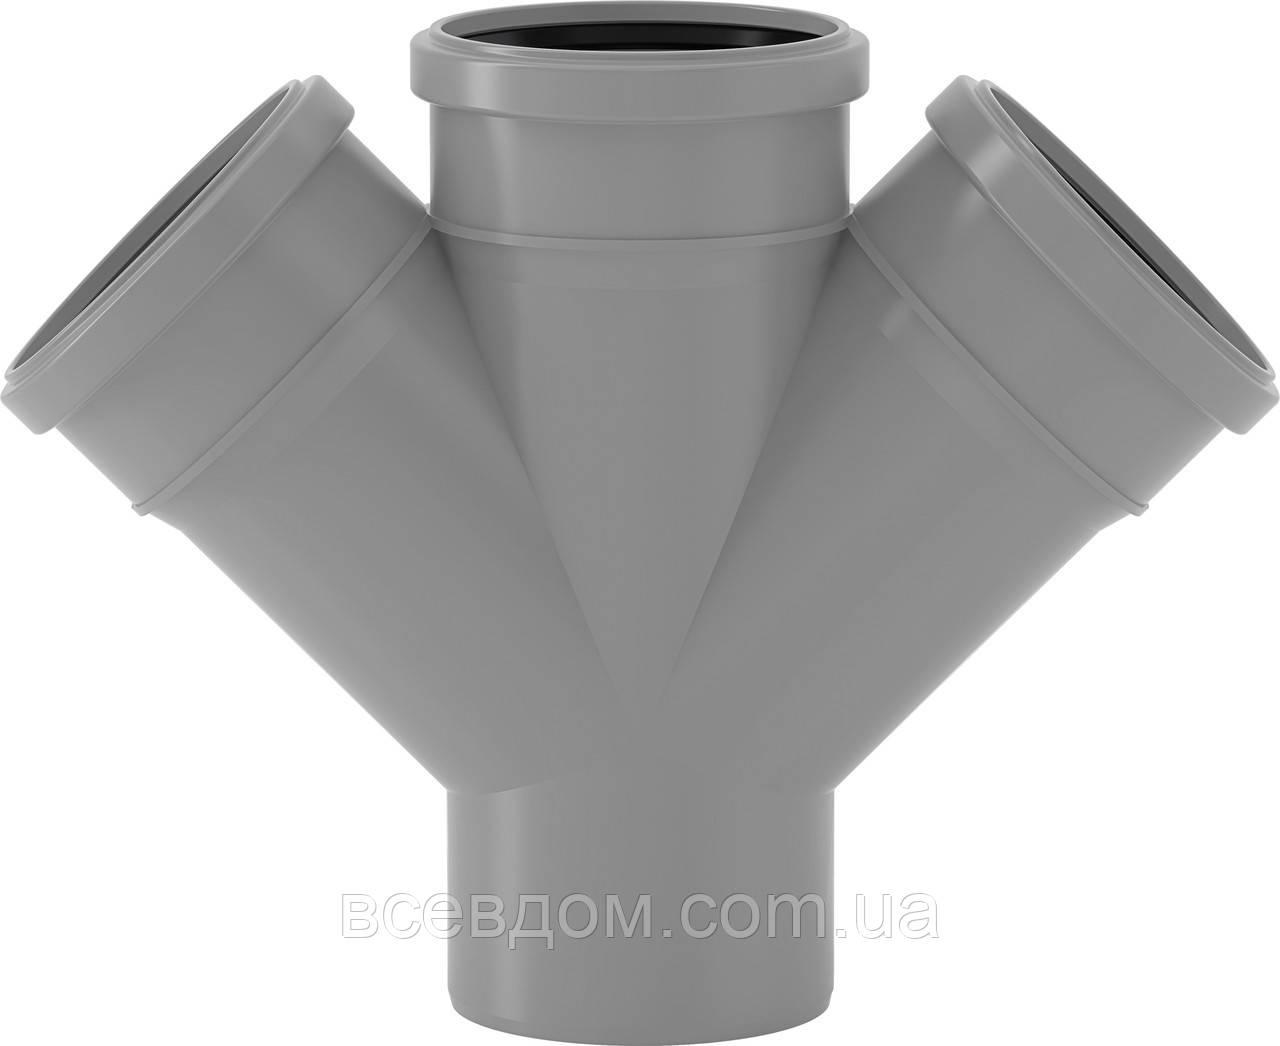 HDTA крестовина Valsir внутренней канализации 110/50/50х87°